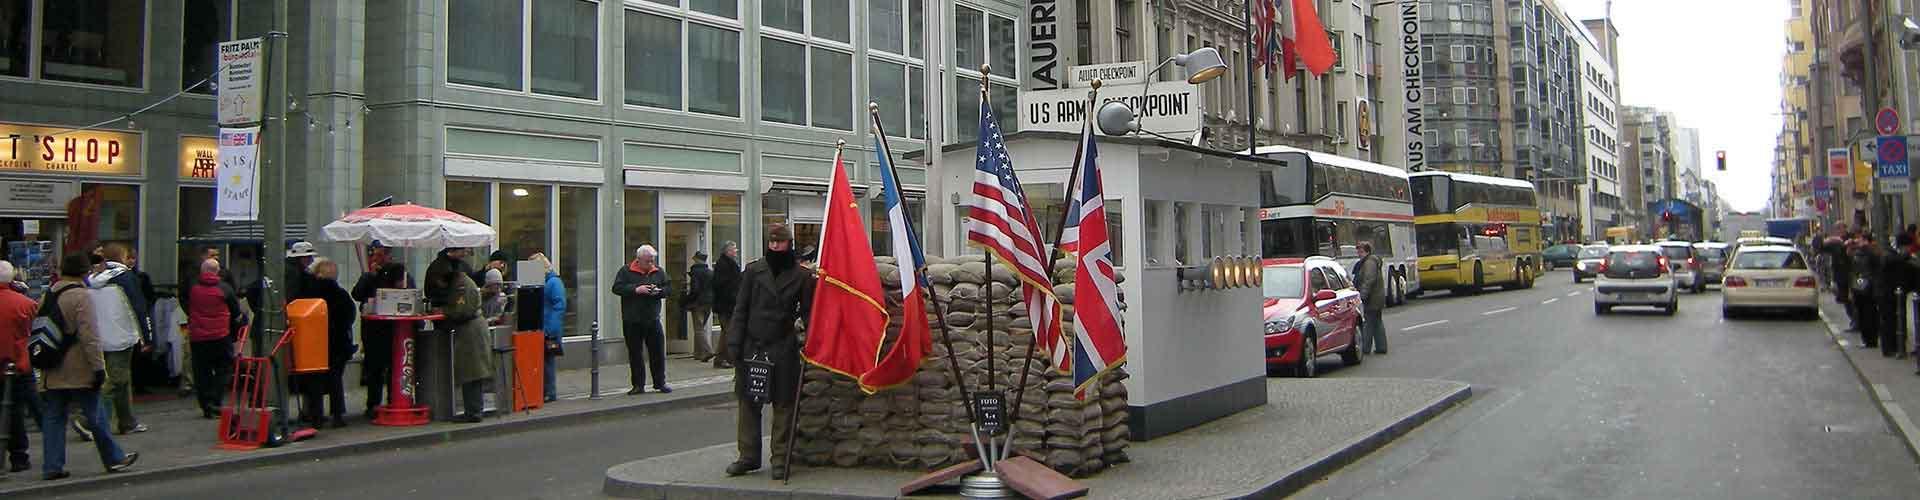 Berlín - Campamentos cerca a Checkpoint Charlie. Mapas de Berlín, Fotos y comentarios de cada Campamento en Berlín.